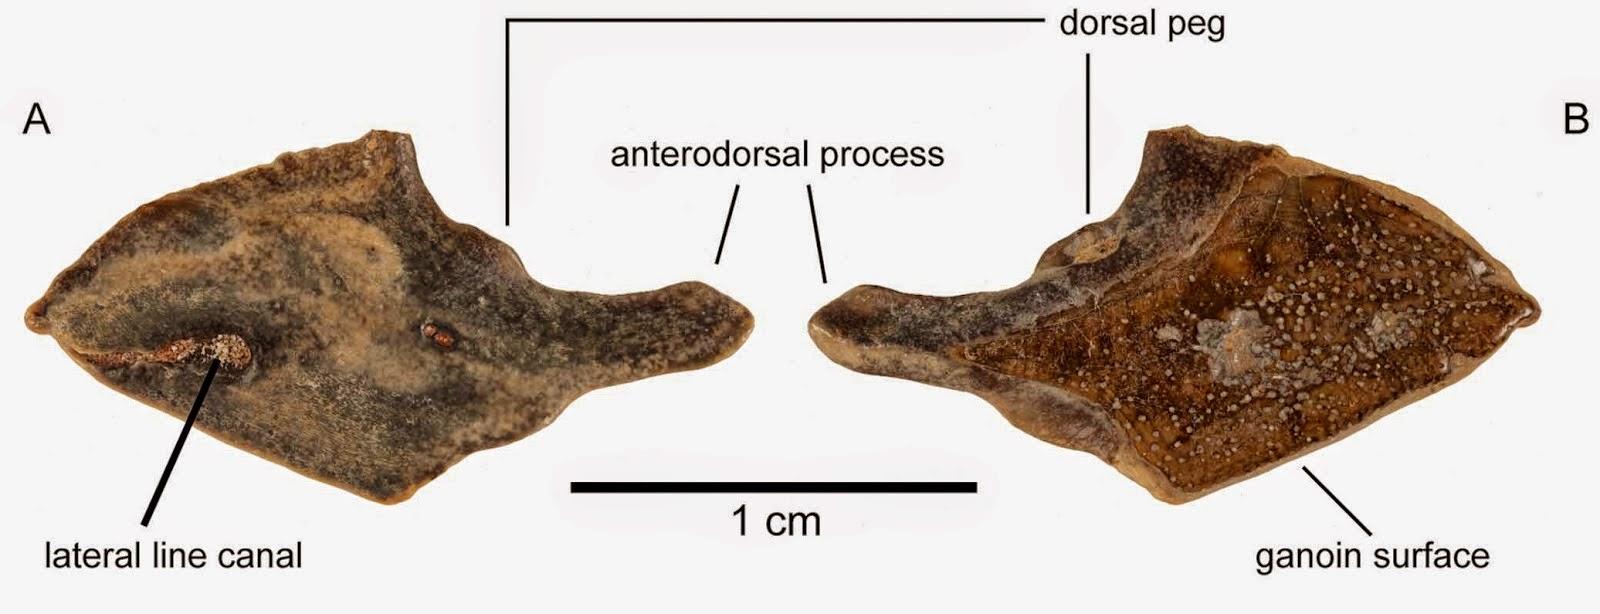 http://sciencythoughts.blogspot.co.uk/2014/05/eocene-non-marine-vertebrate-remains.html